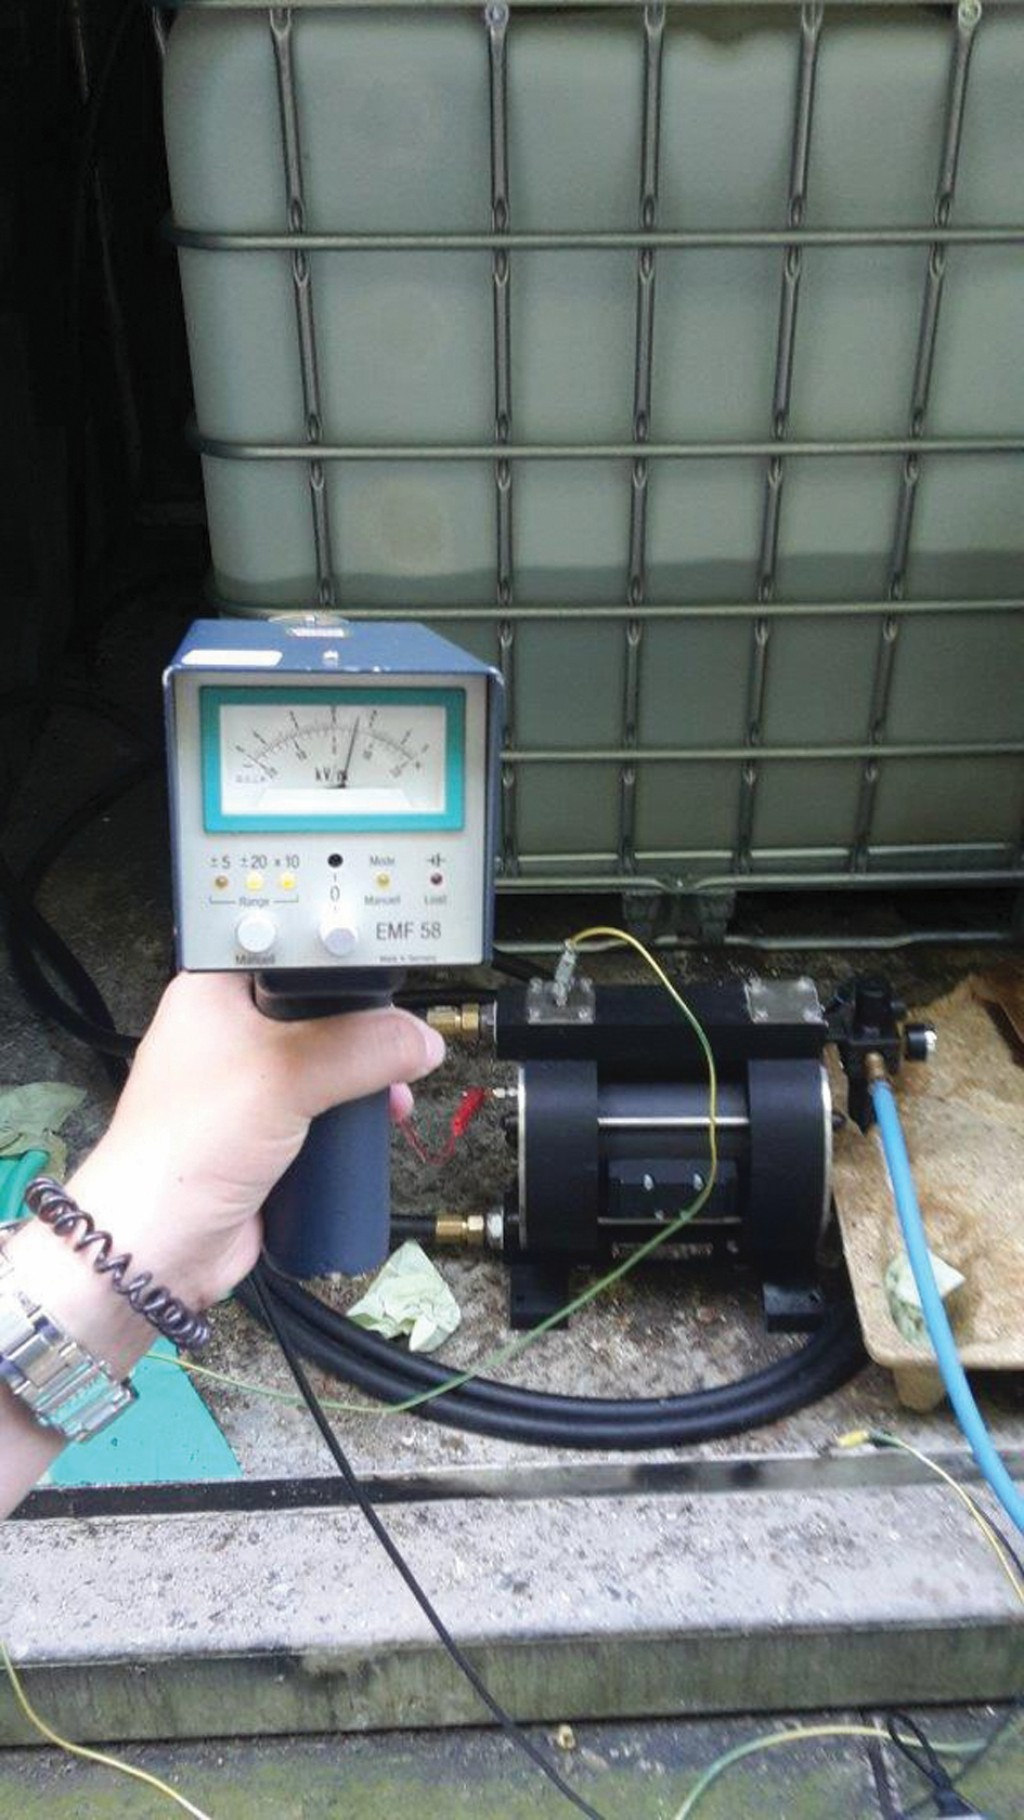 Bild 3 Druckluftmembranpumpe RFML 25 mit Sensor im Praxistest (FLUX GMBH). Quelle: PTB